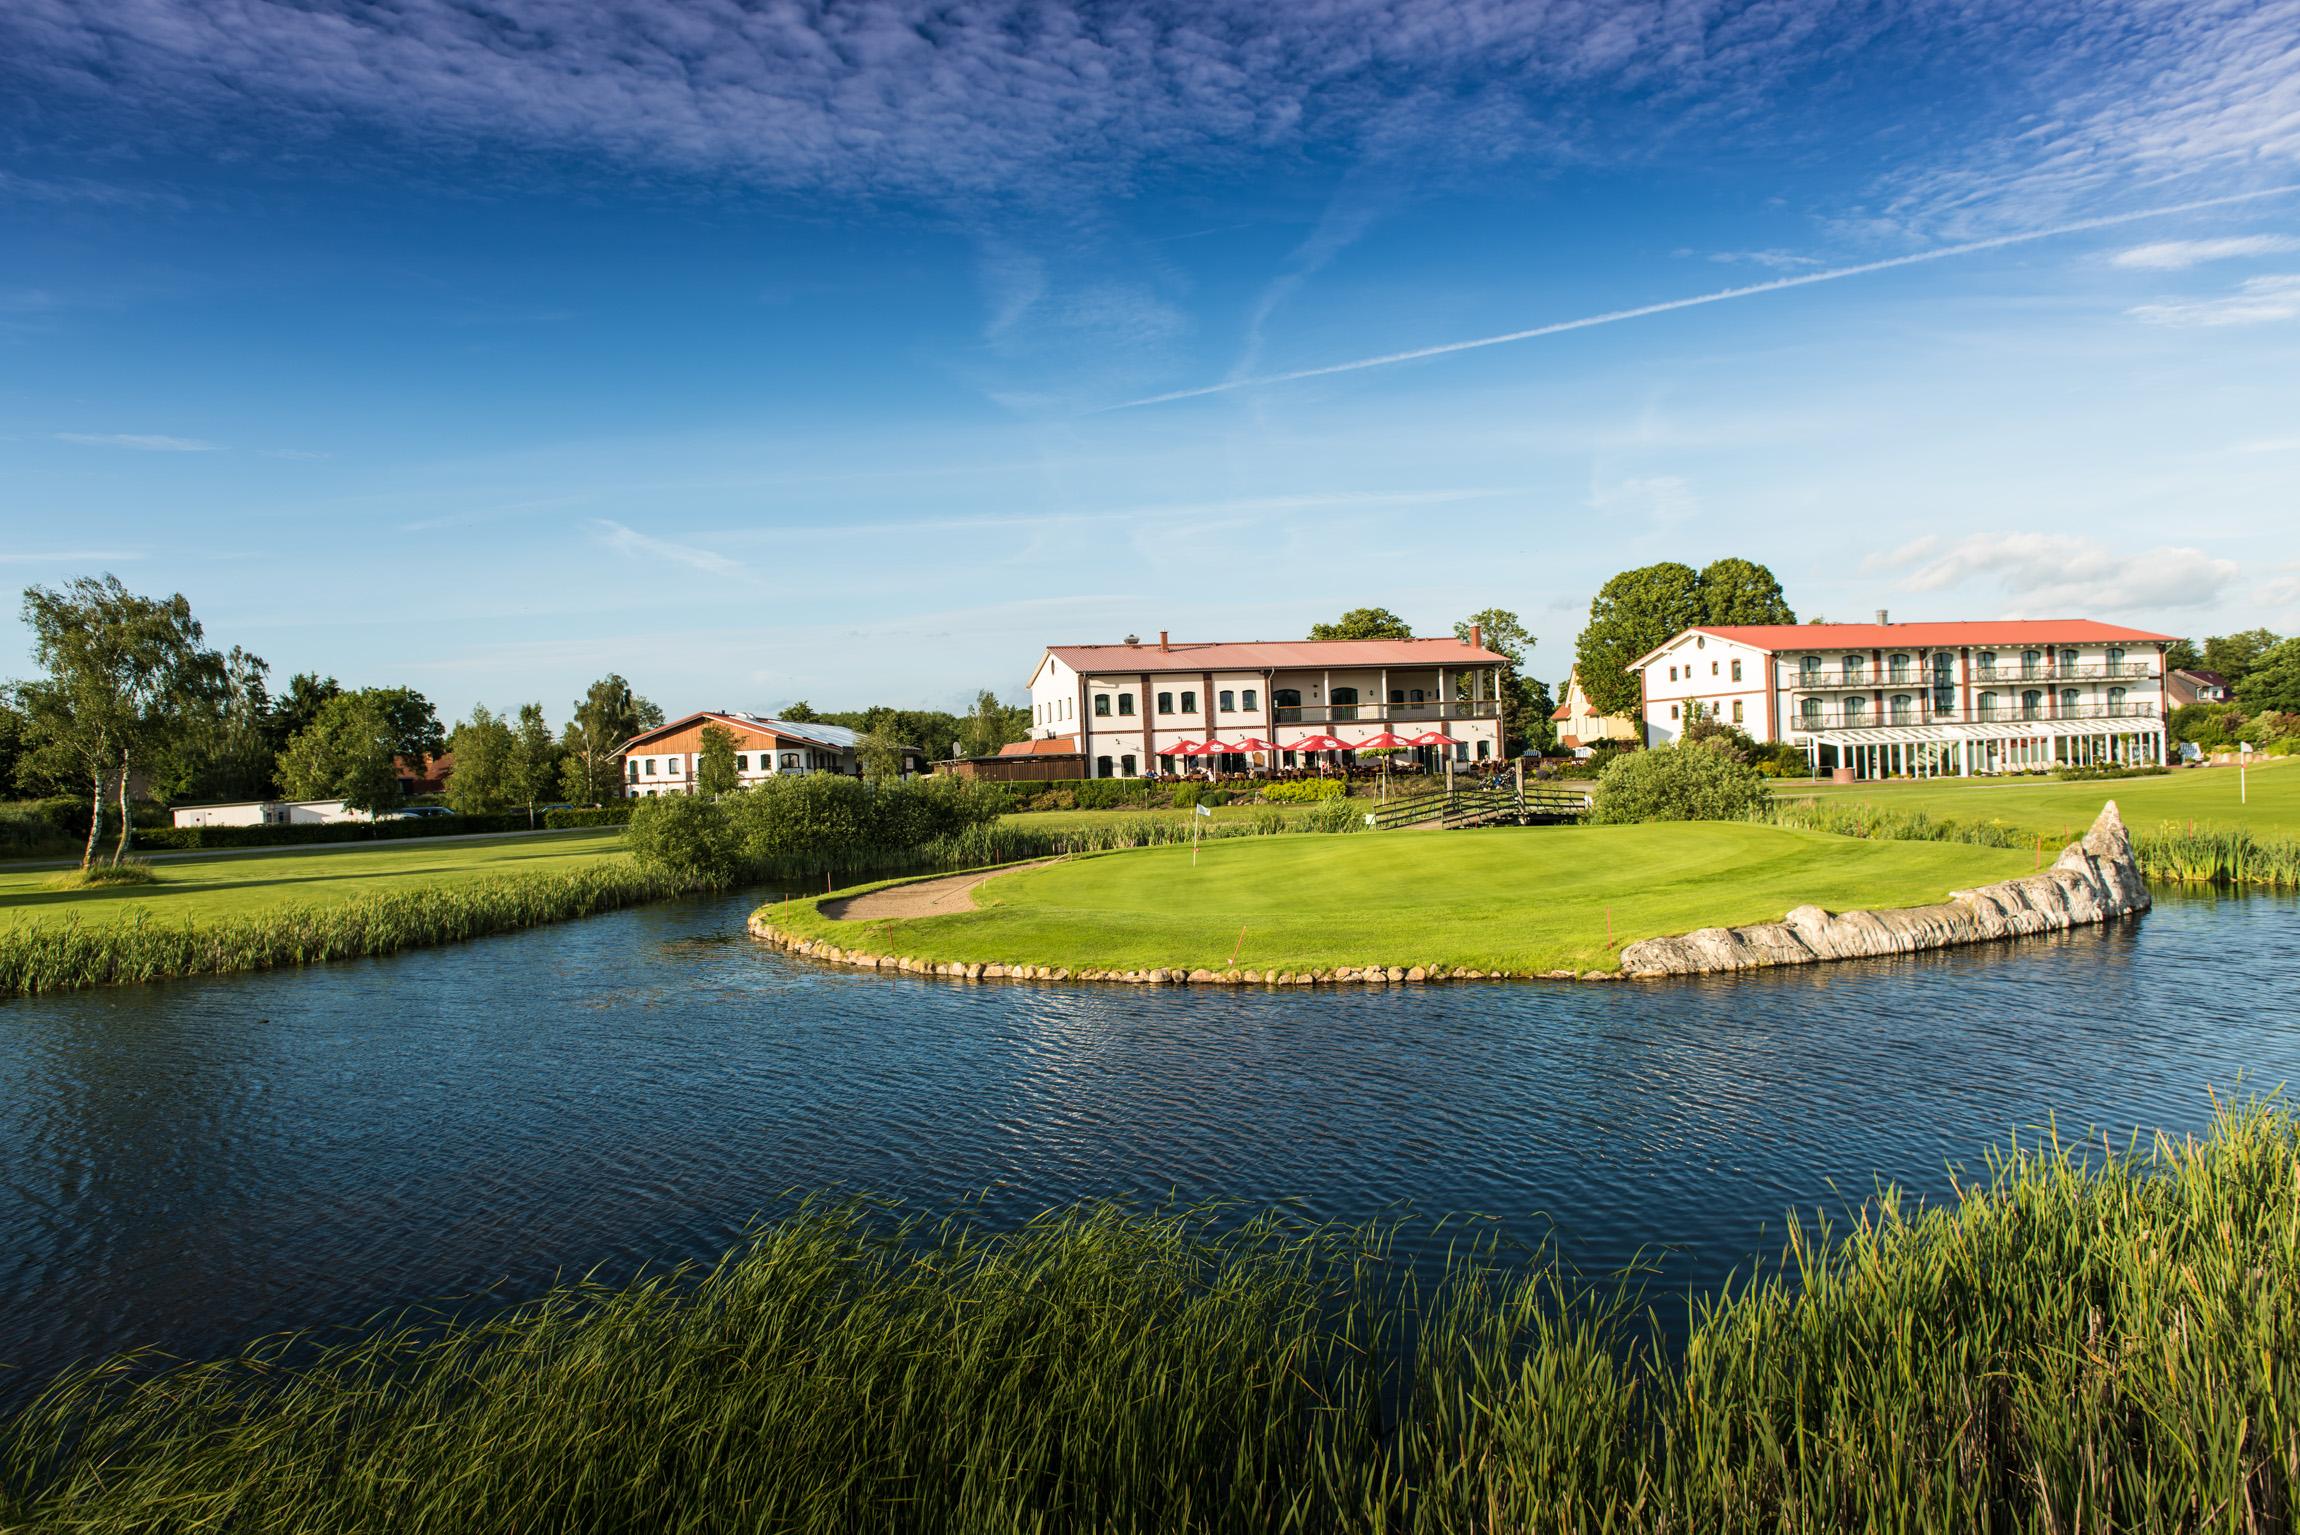 Golfpark Strelasund